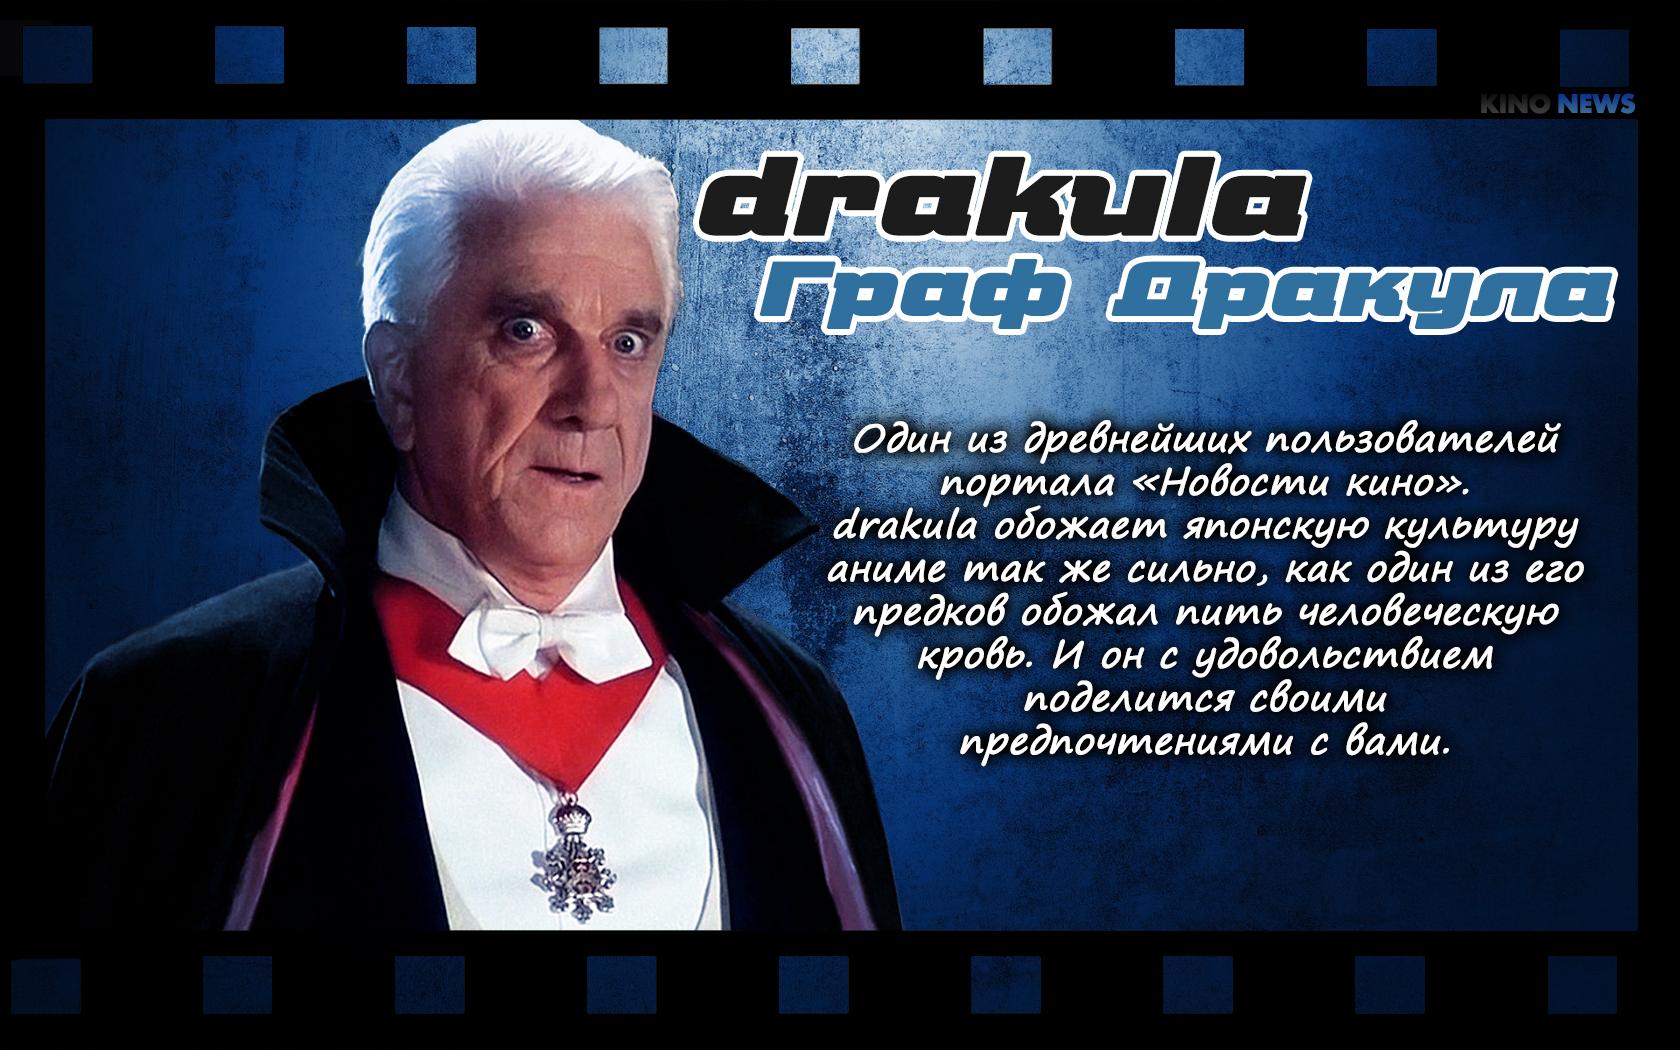 https://www.kinonews.ru/insimgs/2017/persimg/persimg77944_9.jpg